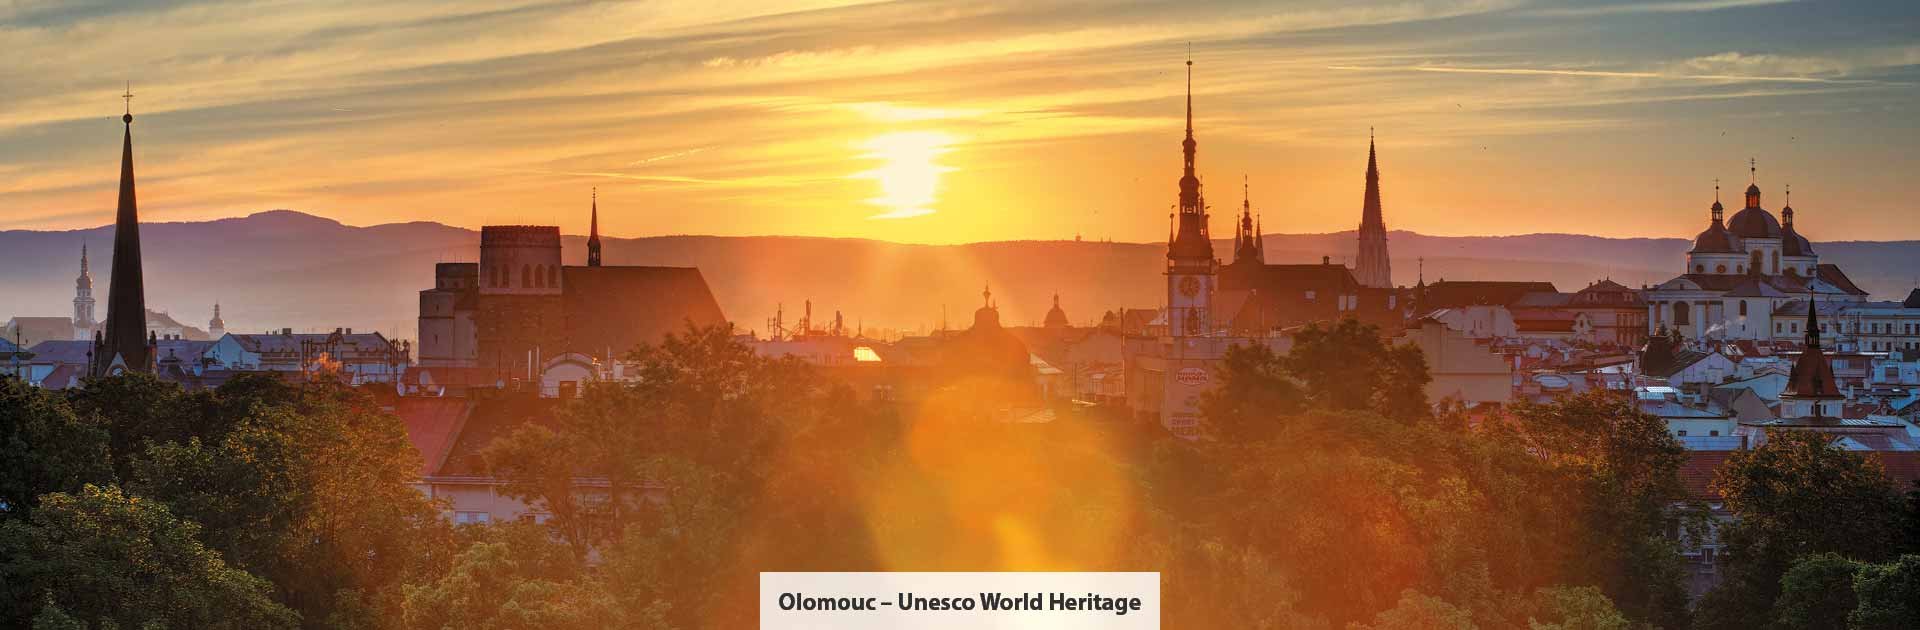 Olomouc - Česká republika UNESCO